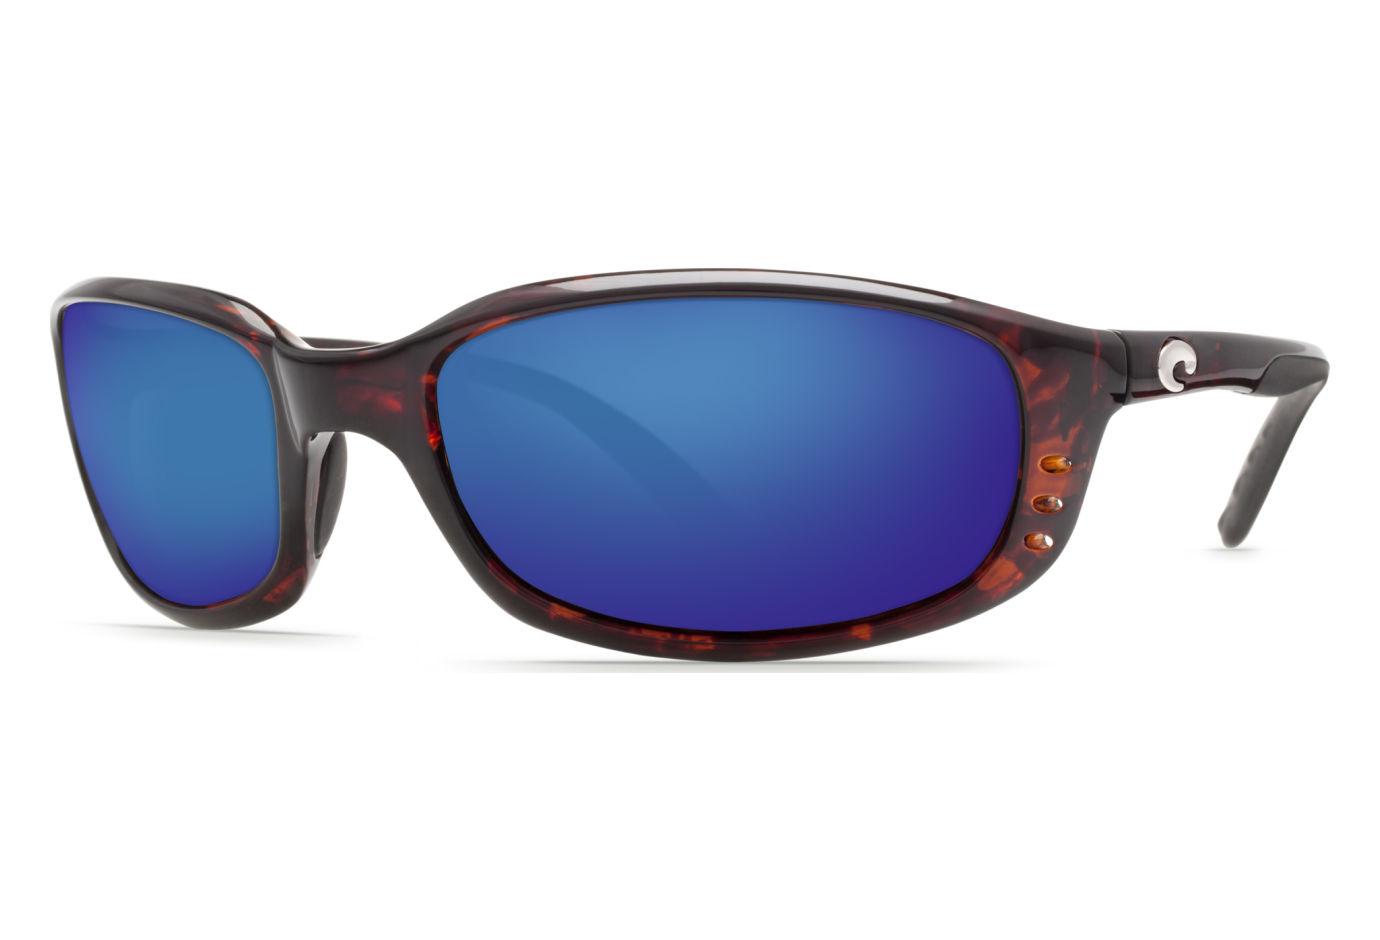 ac8ab064f2 Costa Brine Polarized 400g Sunglasses